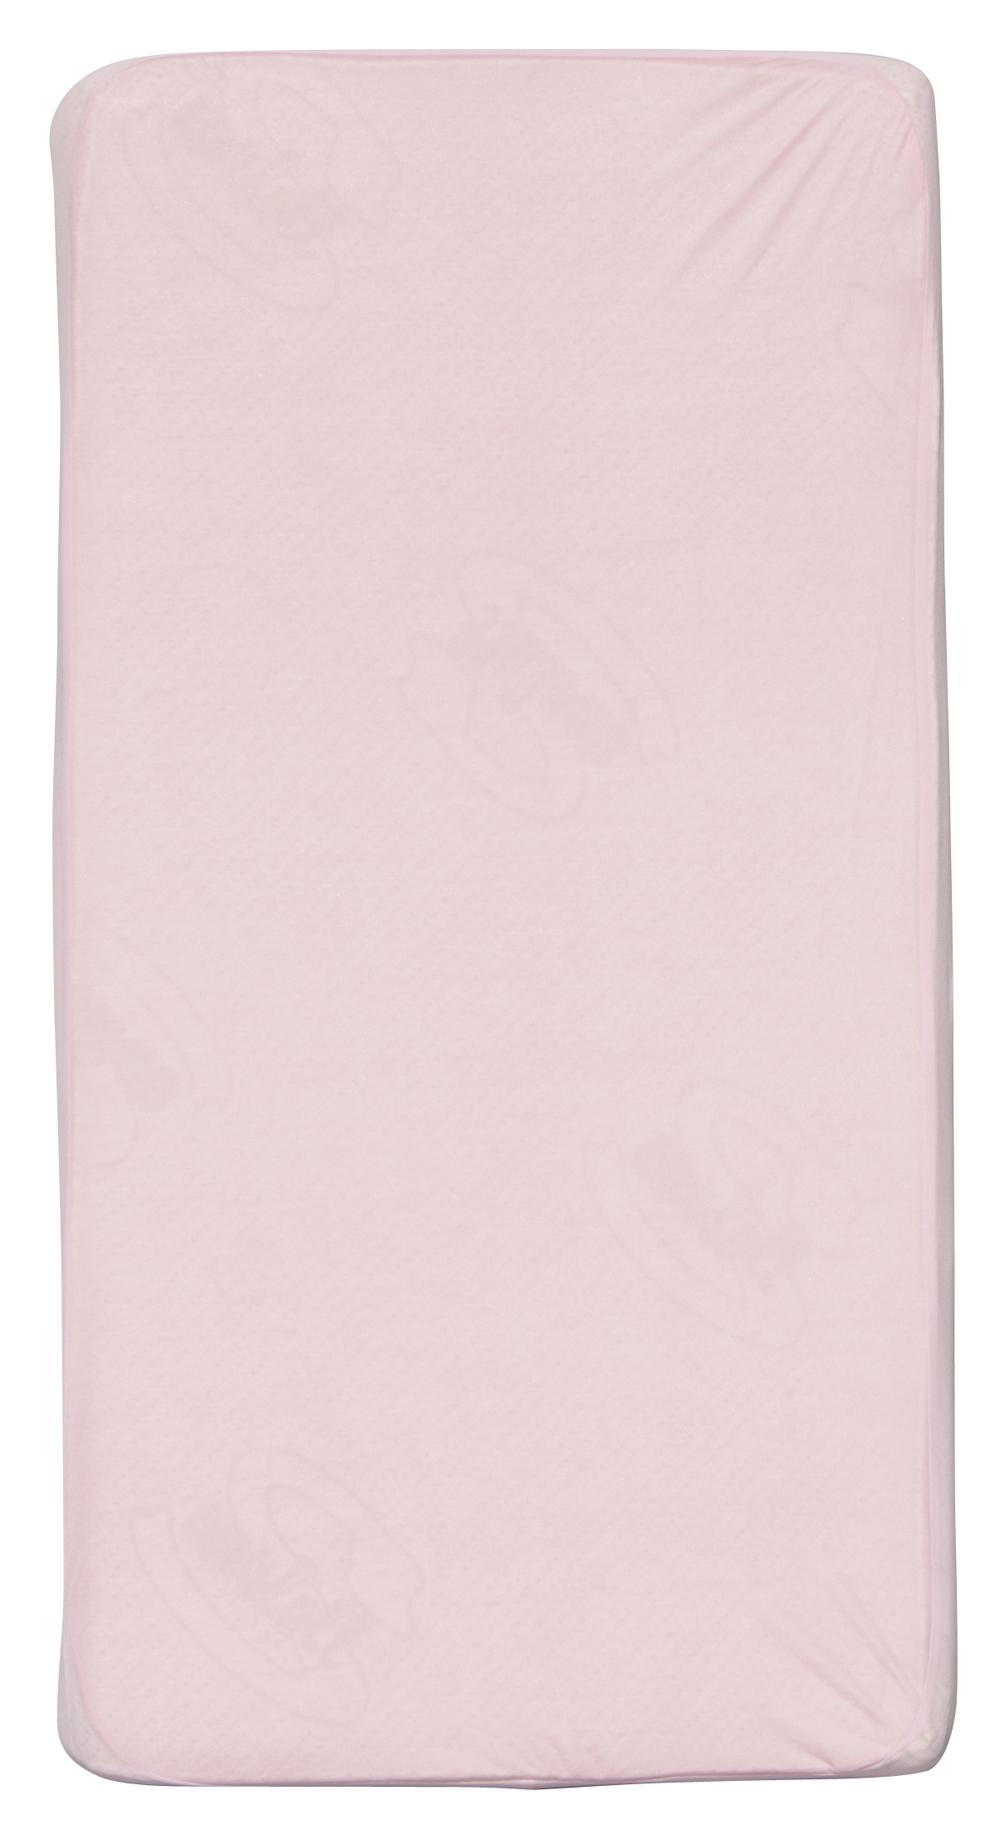 Scarlett, Nepropustné prostěradlo TENCEL - růžová 60 x 120 cm